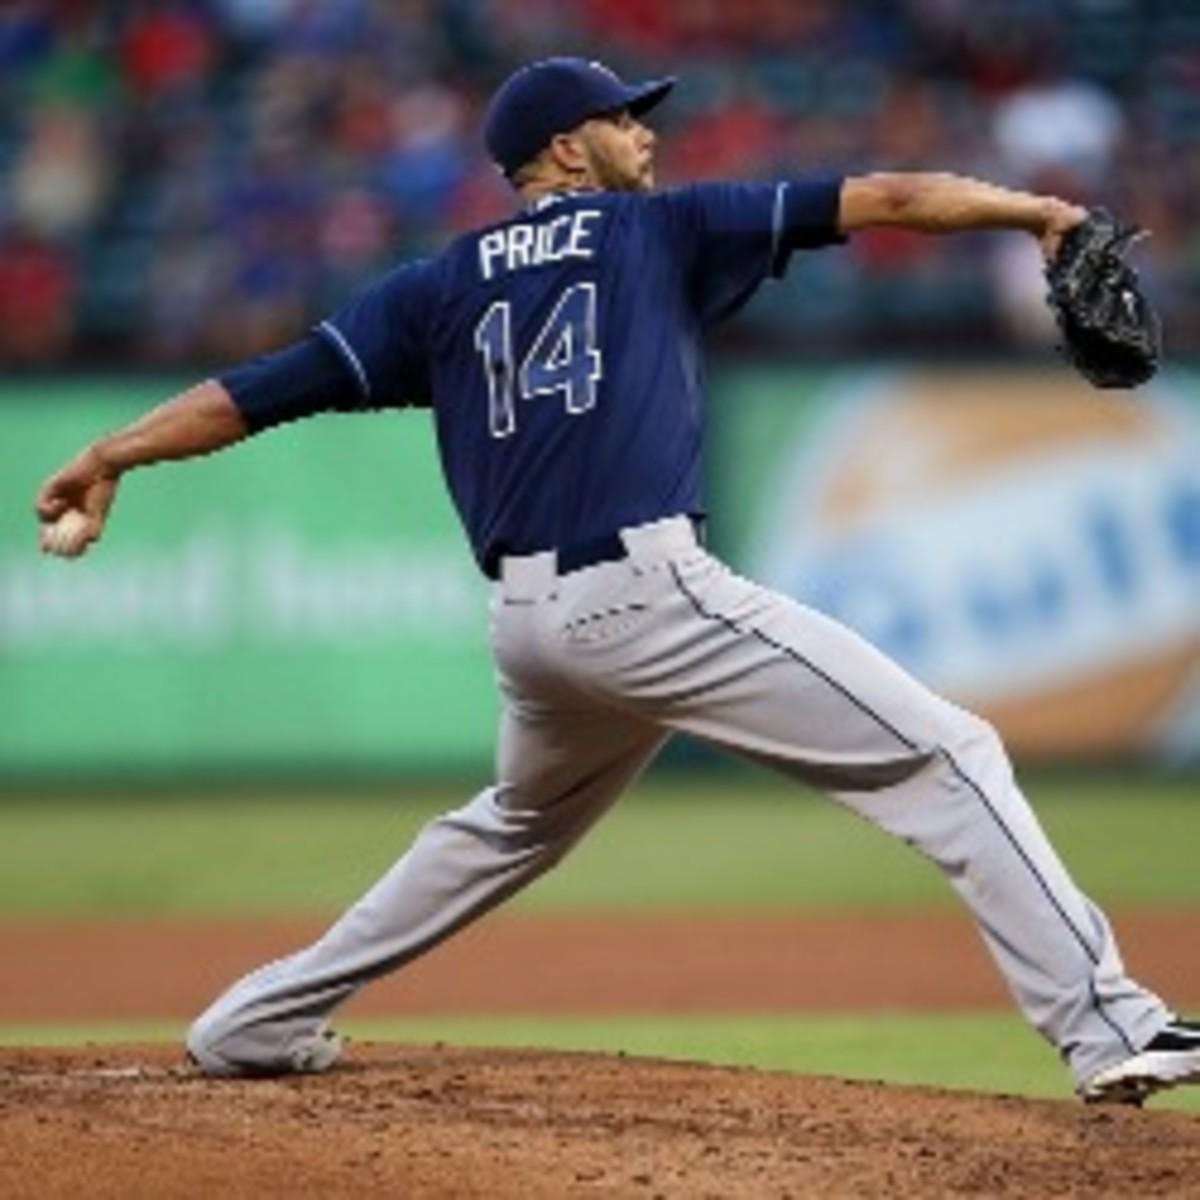 at Rangers Ballpark in Arlington on August 27, 2012 in Arlington, Texas.